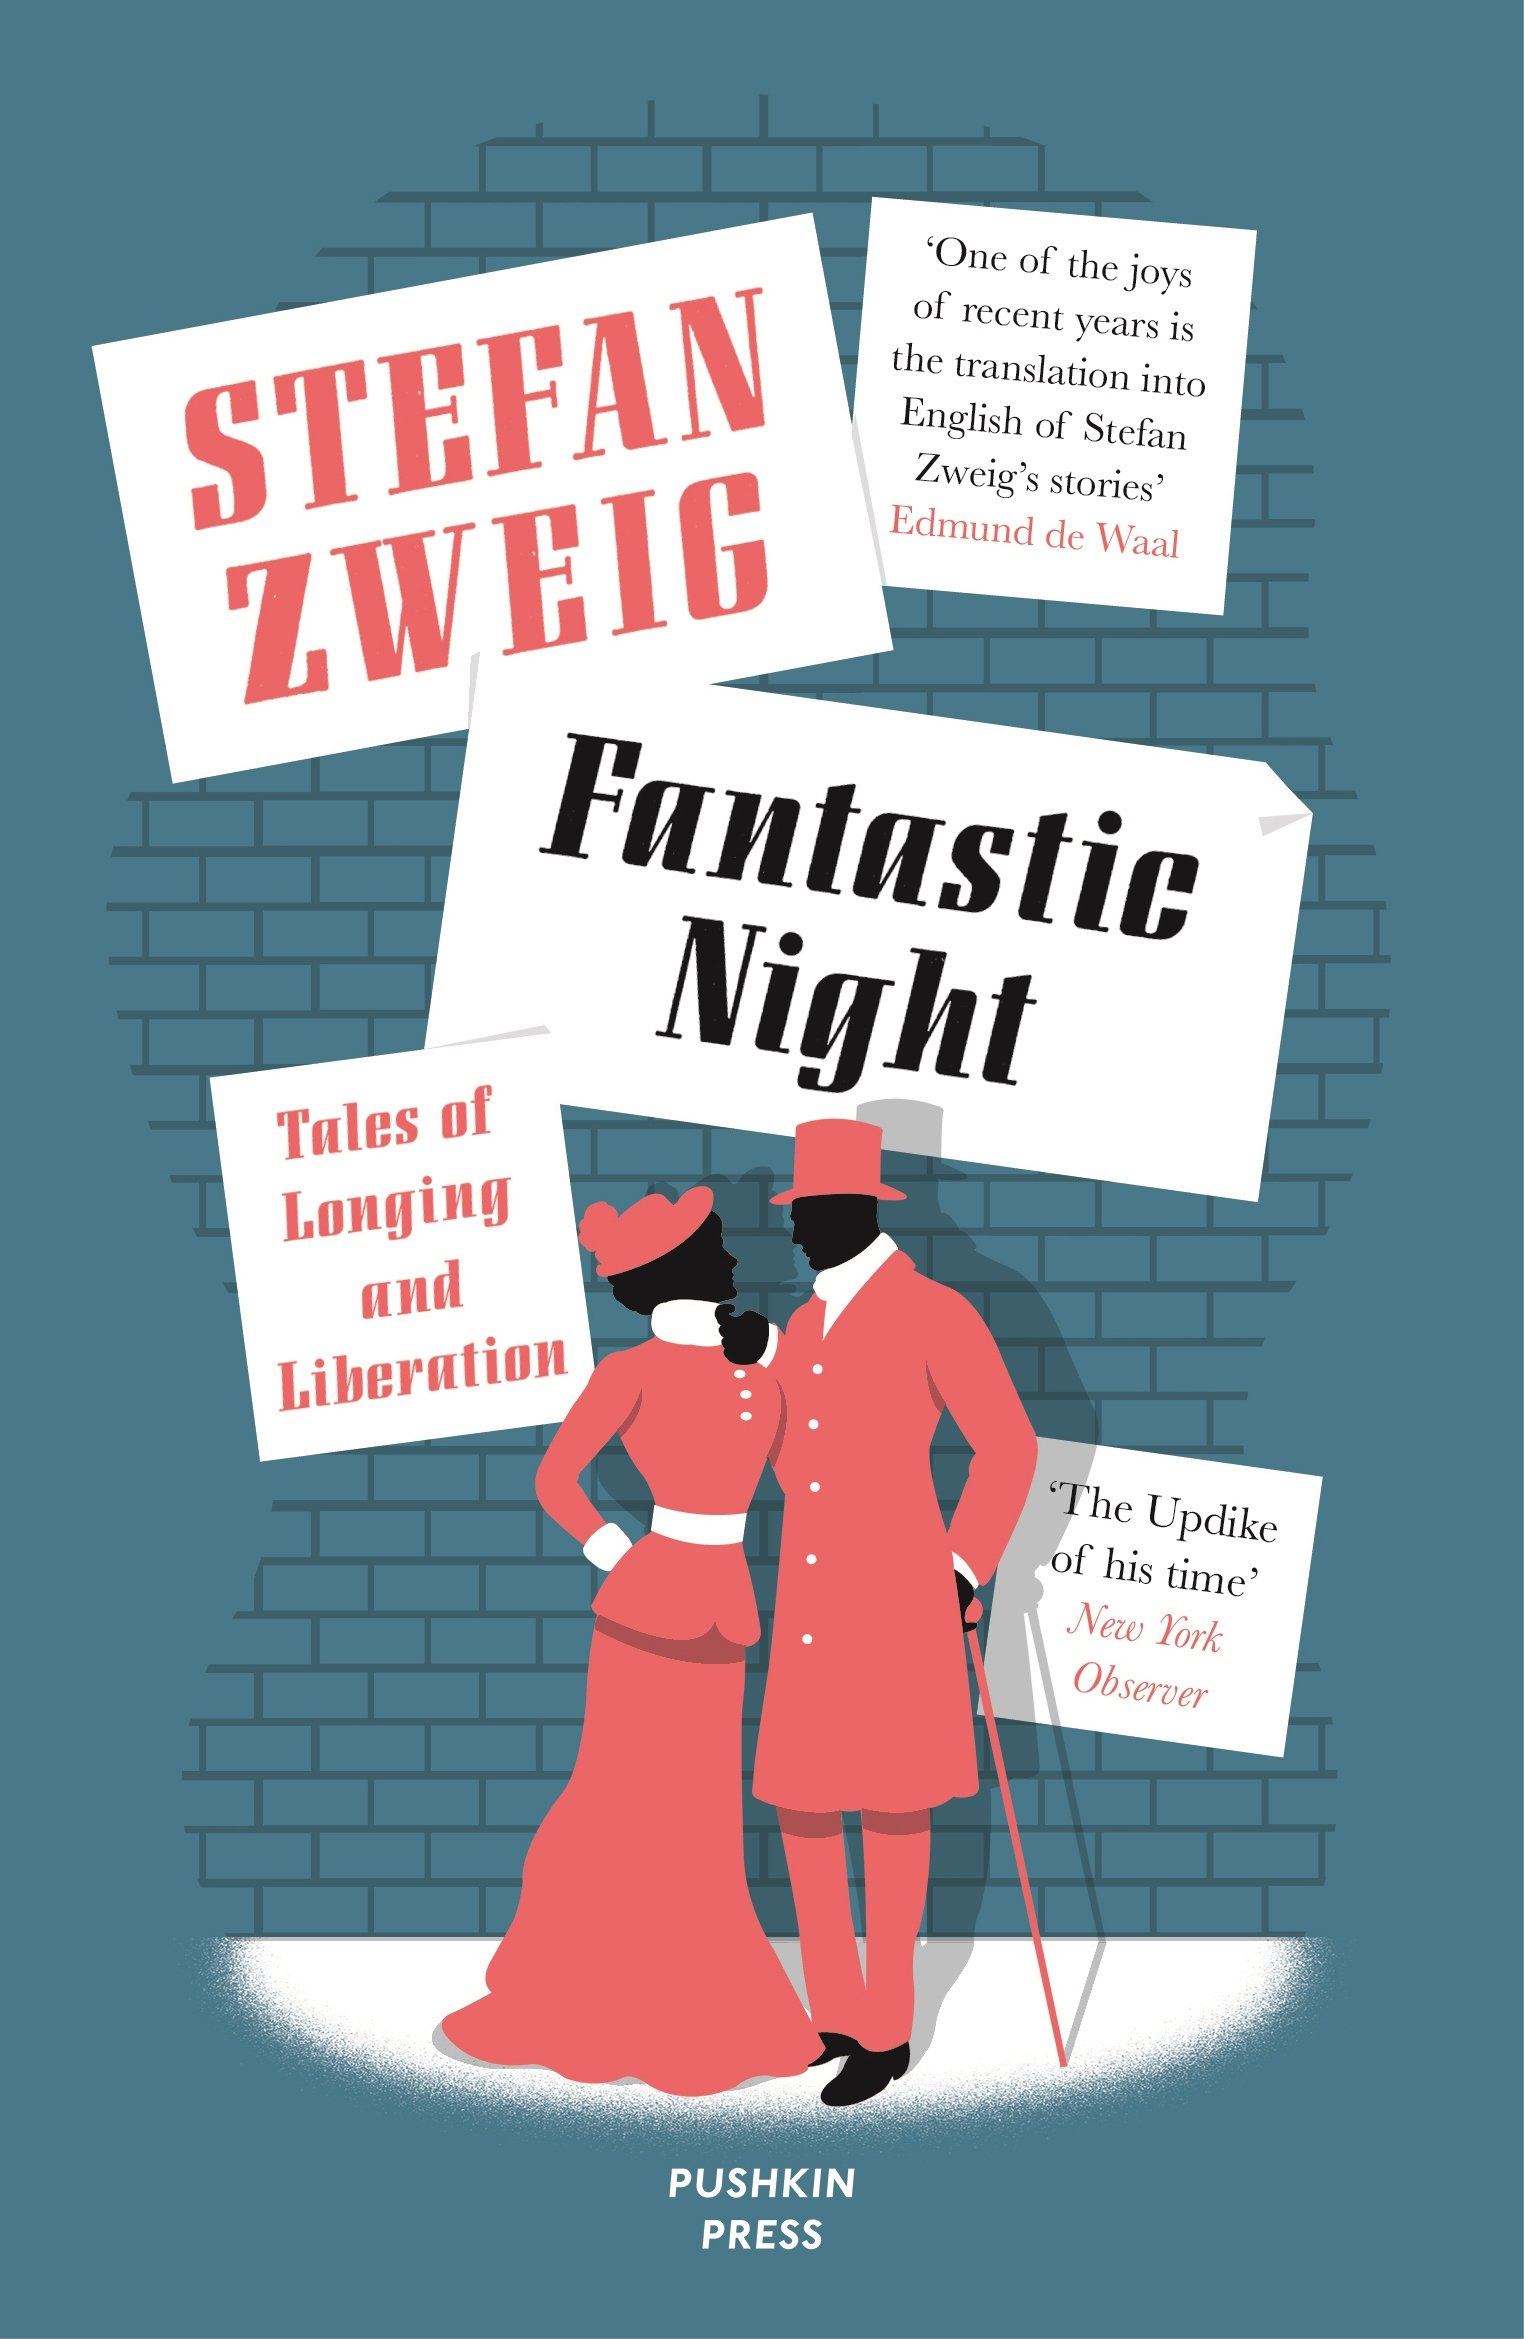 Zweig Fantastic Night cover art